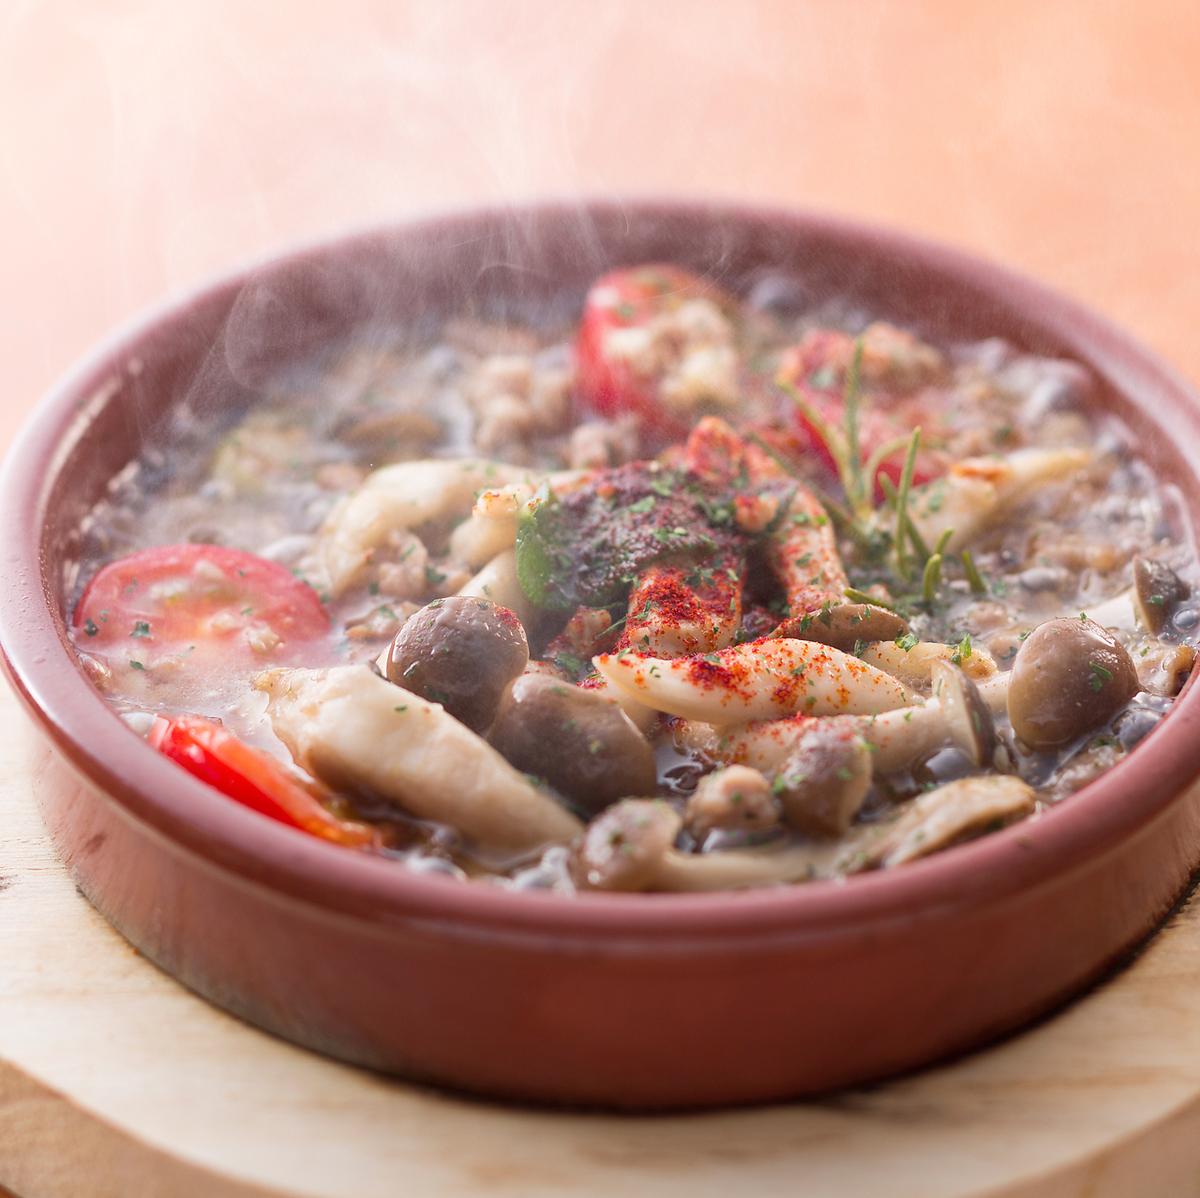 熏制剁碎和土佐传奇shimeji的ahijo